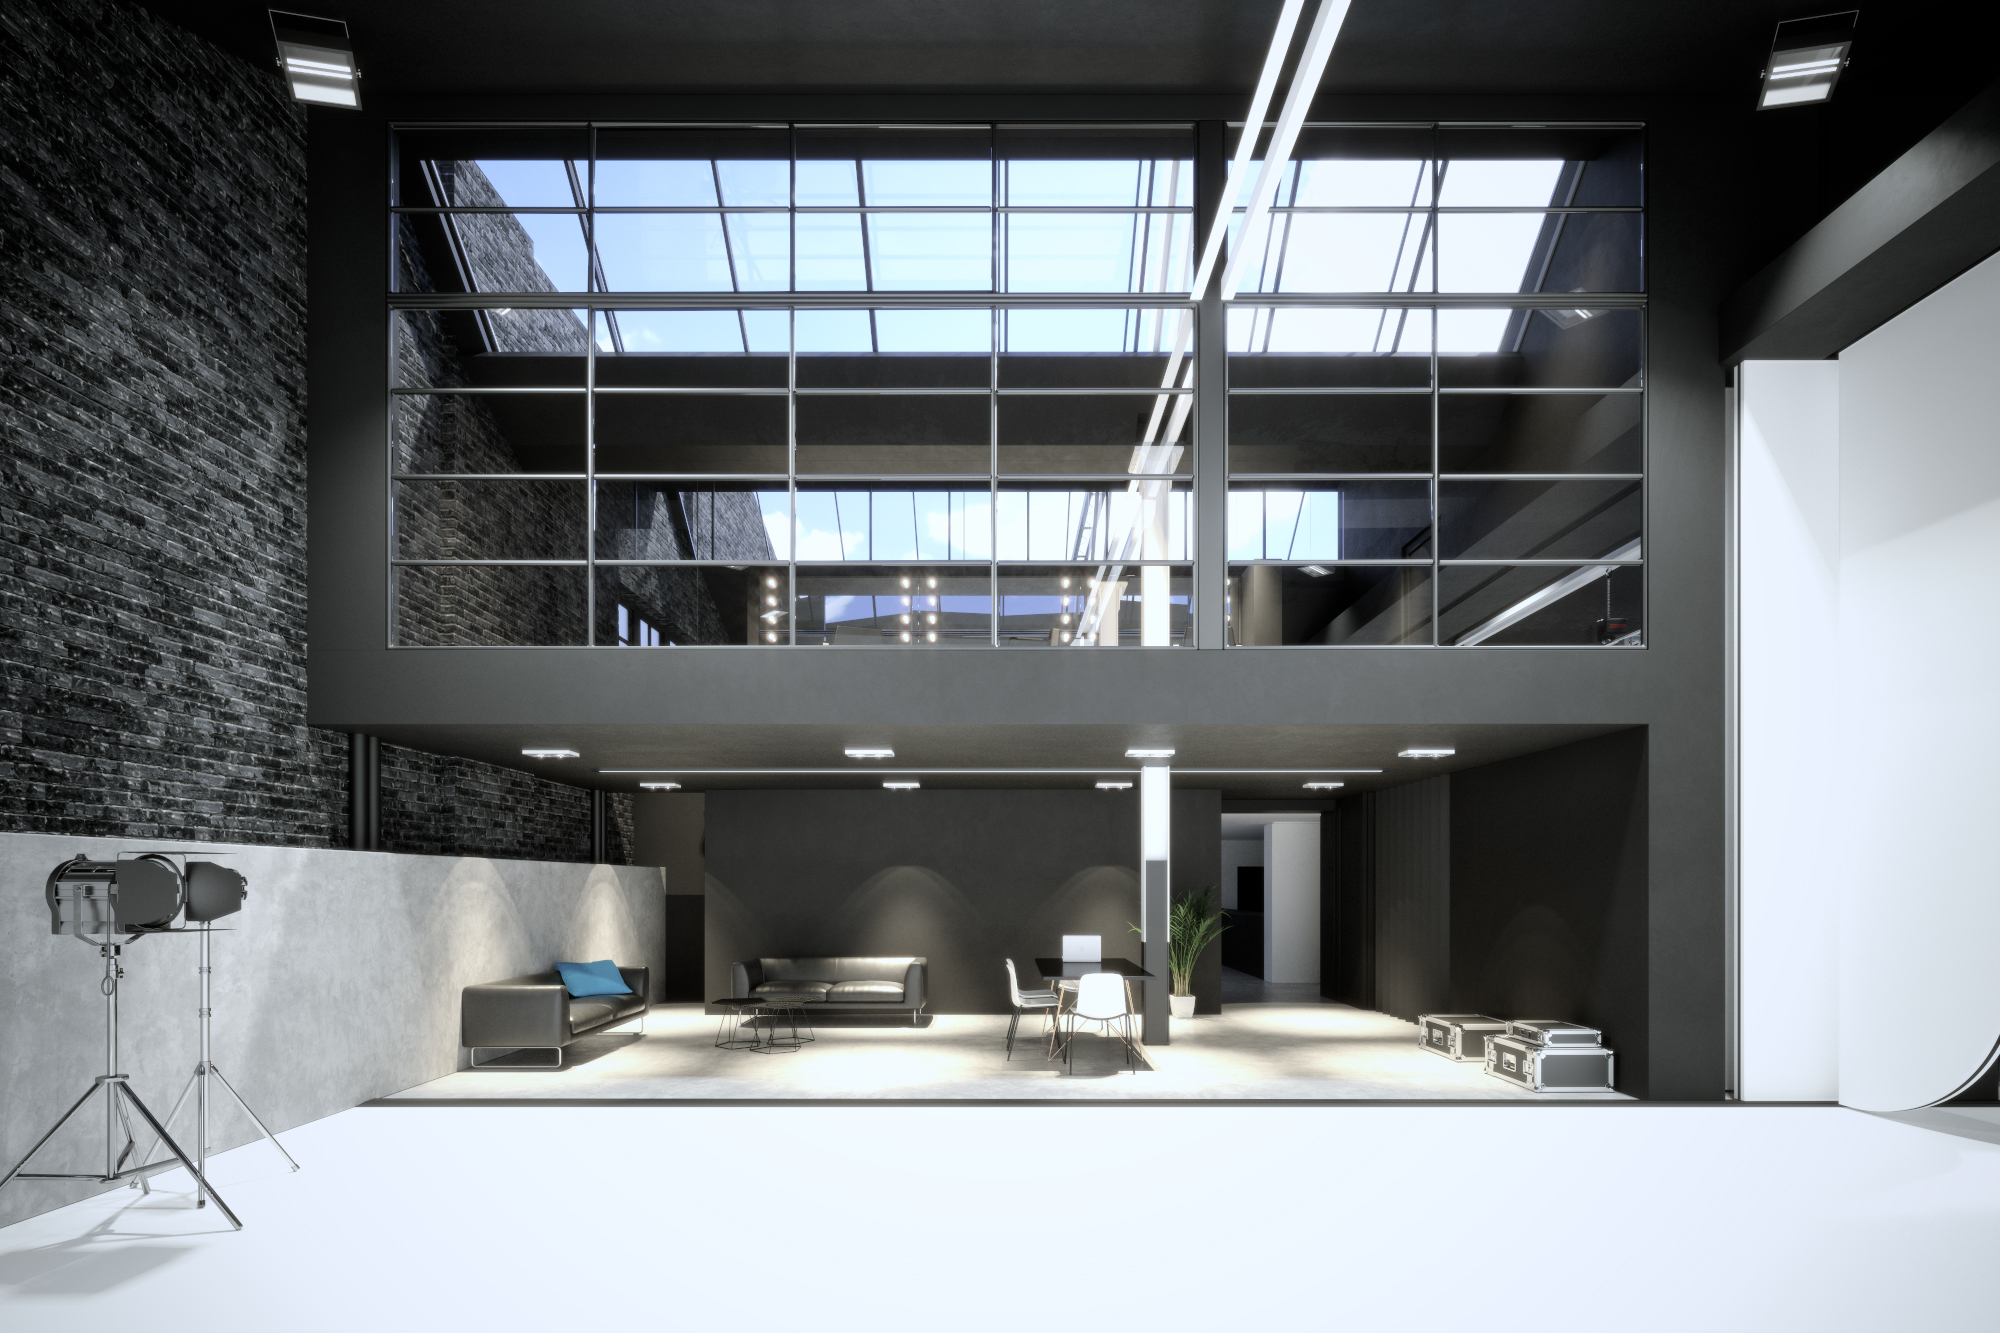 Alva Studios North    Location:  Caledonian Road    Floor Area : 2450m2 sqm   Budget:  £6m   Client:  Pro-Lighting   View More